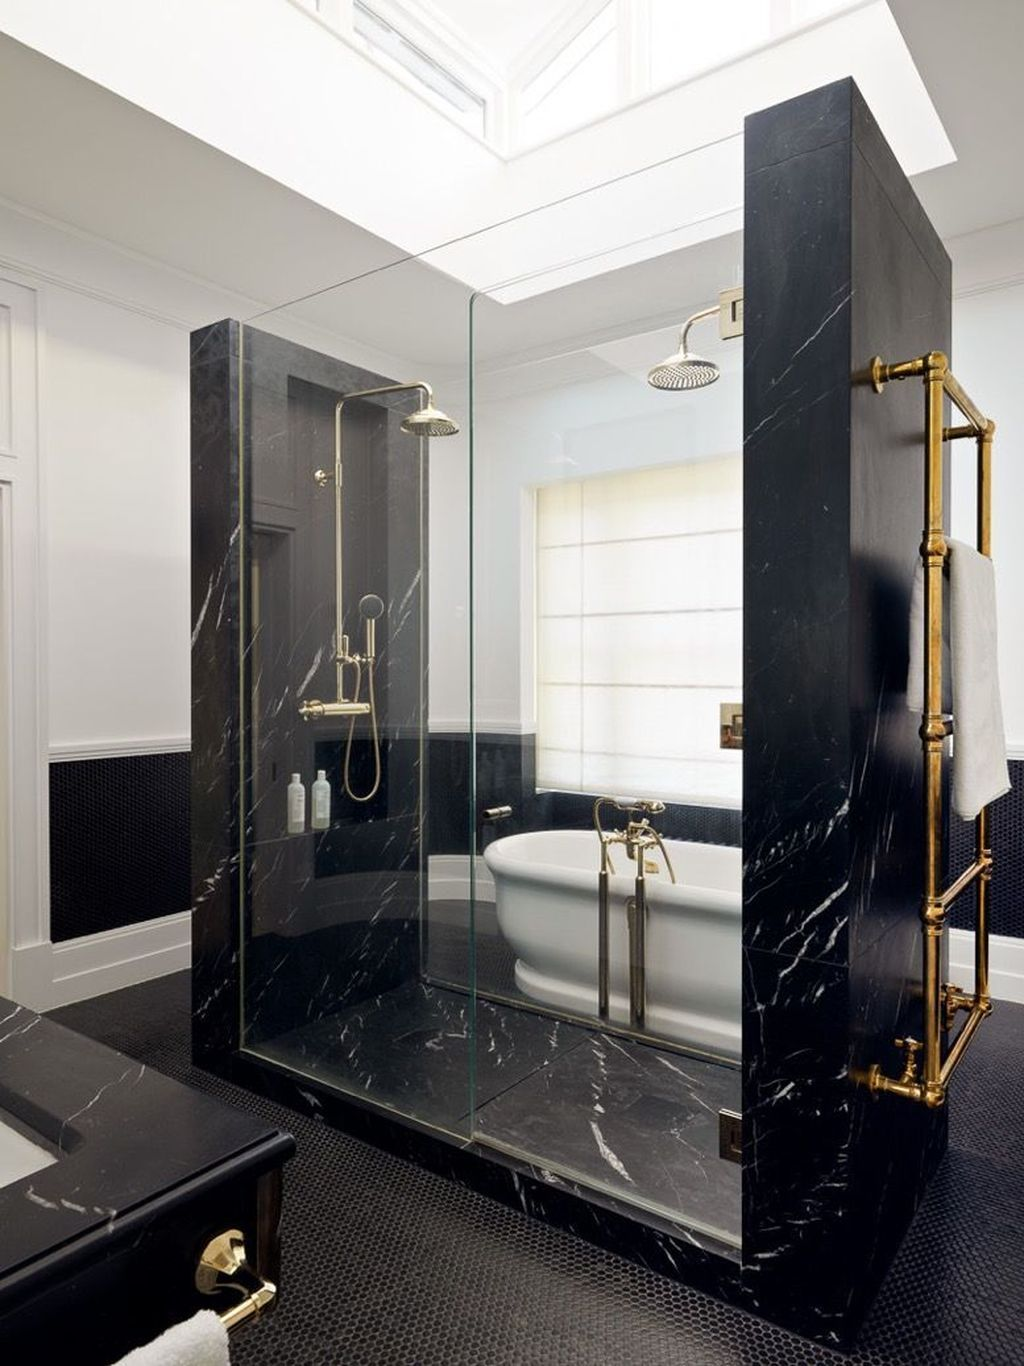 48 stunning black marble bathroom design ideas bathroomdesignmarble rh pinterest com